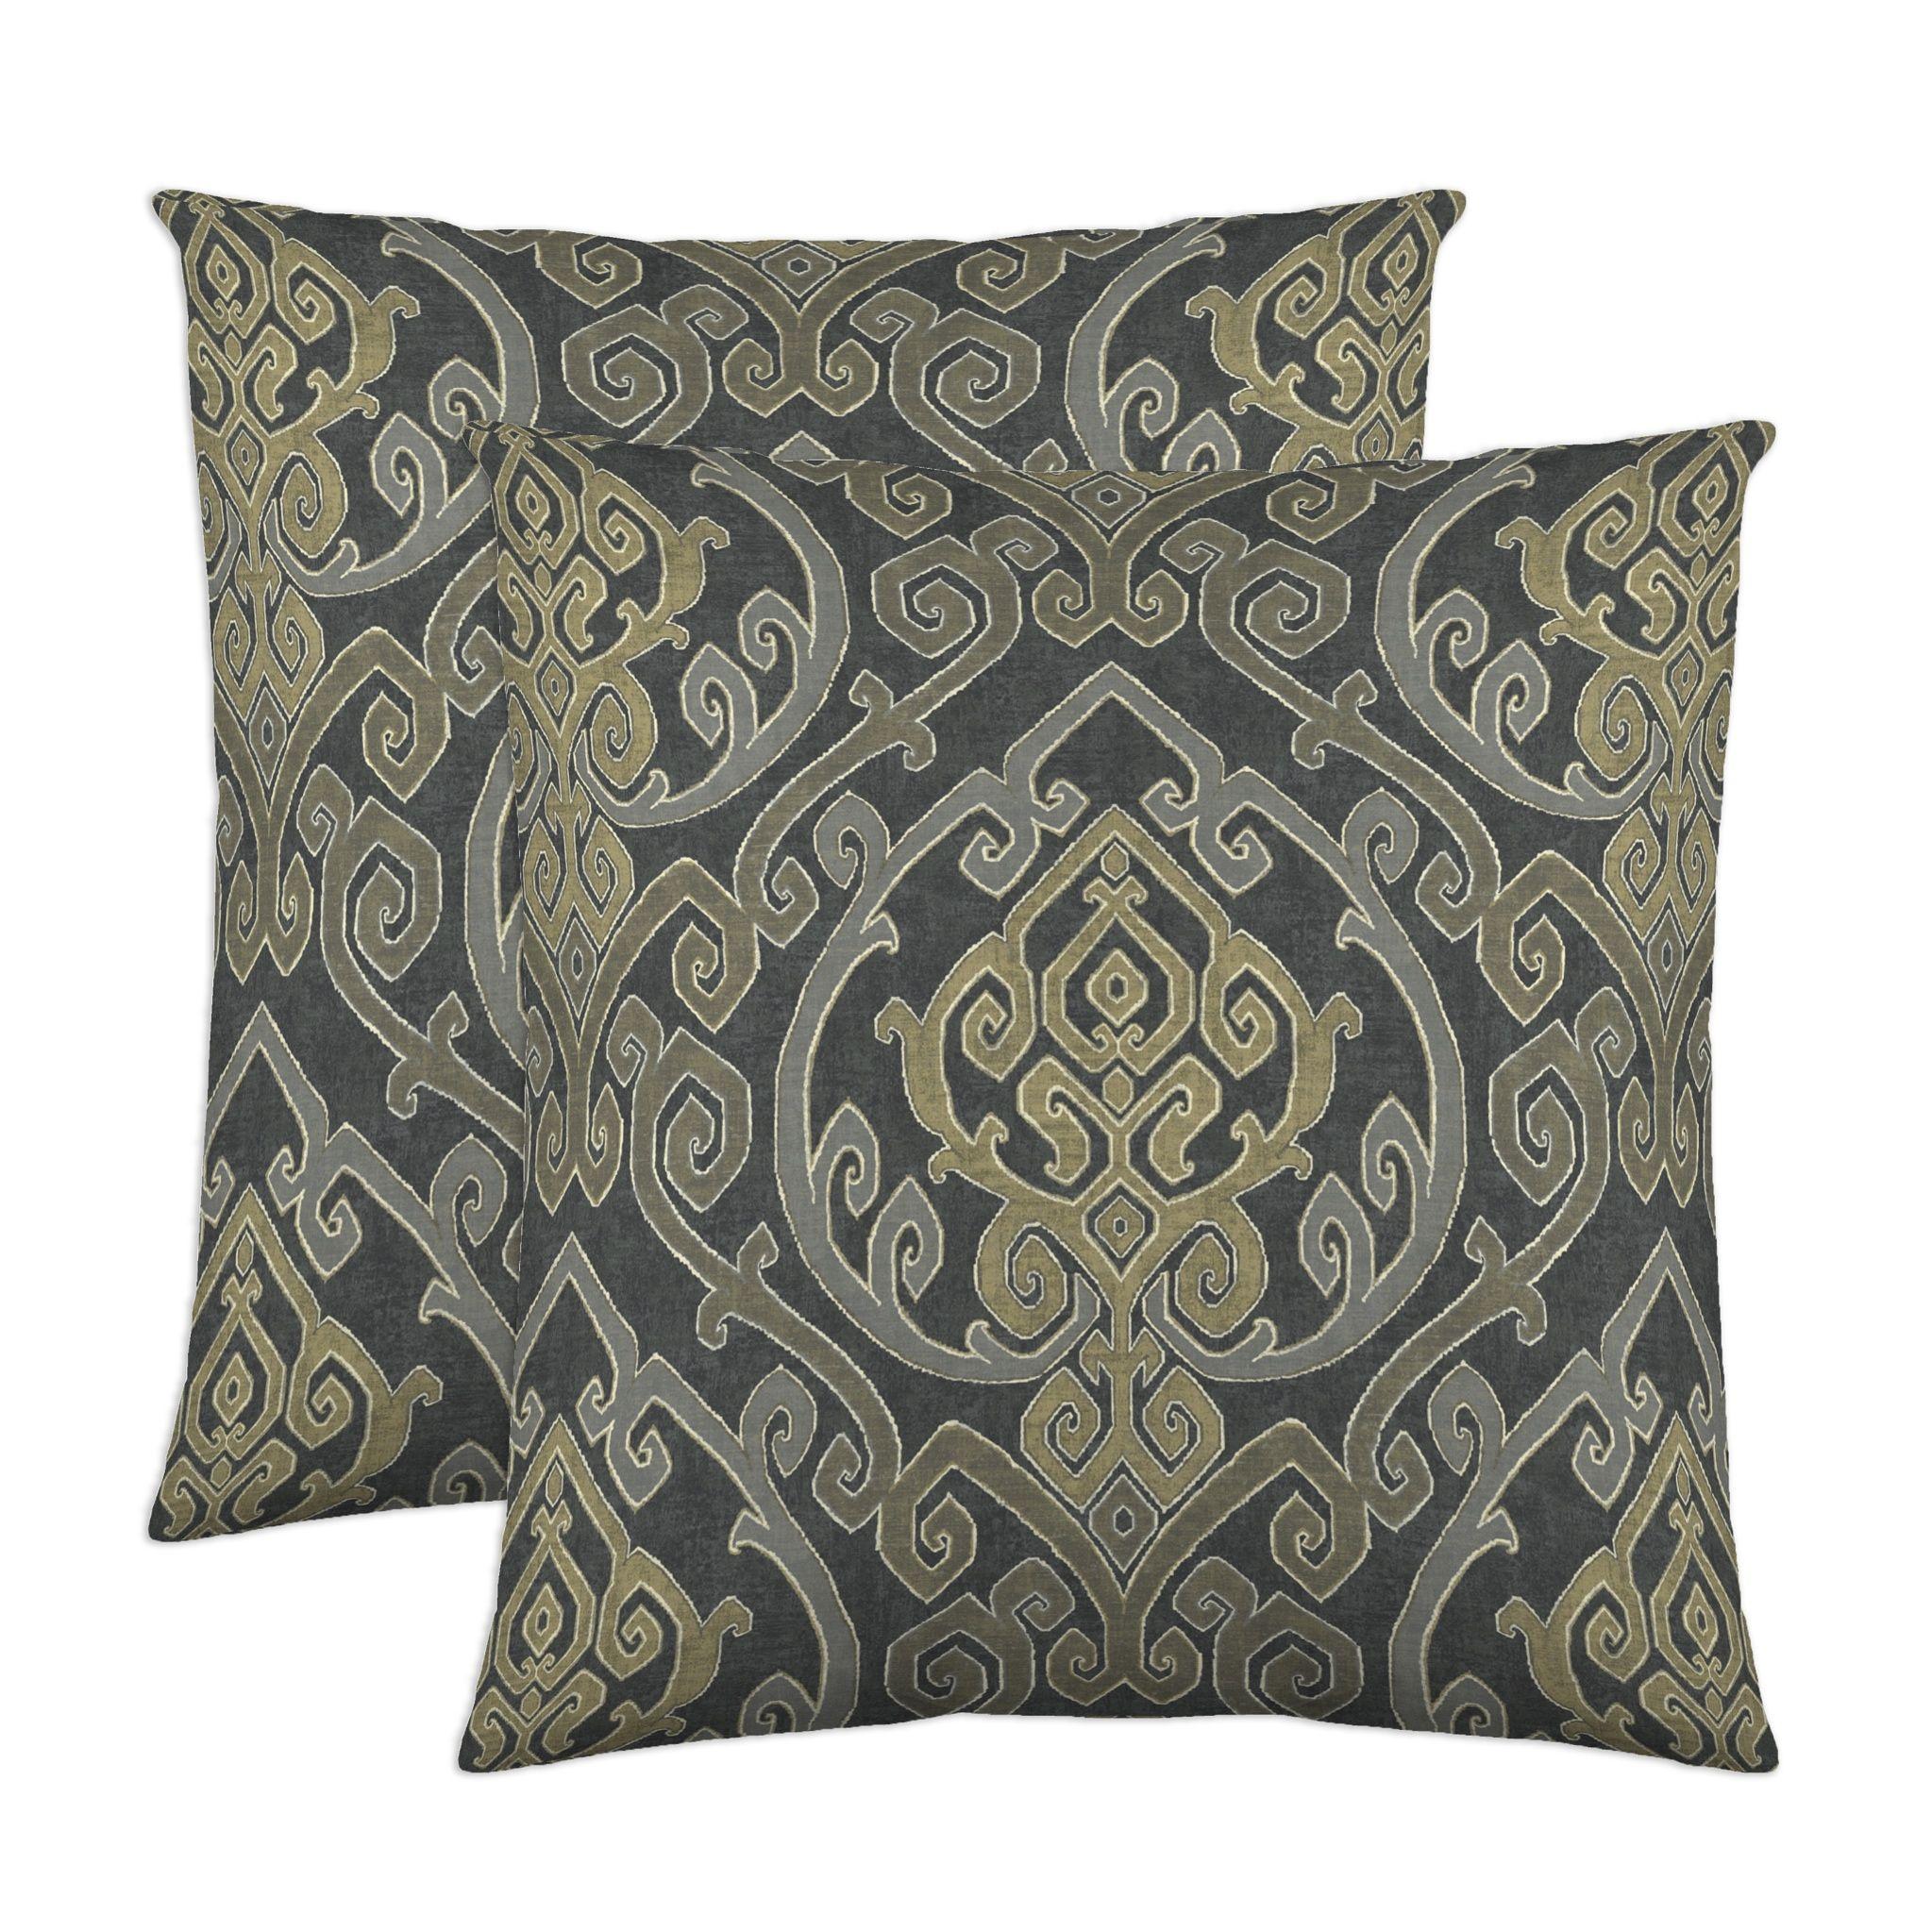 Colorfly home pillows u uzayau in charcoal pillows homedecor